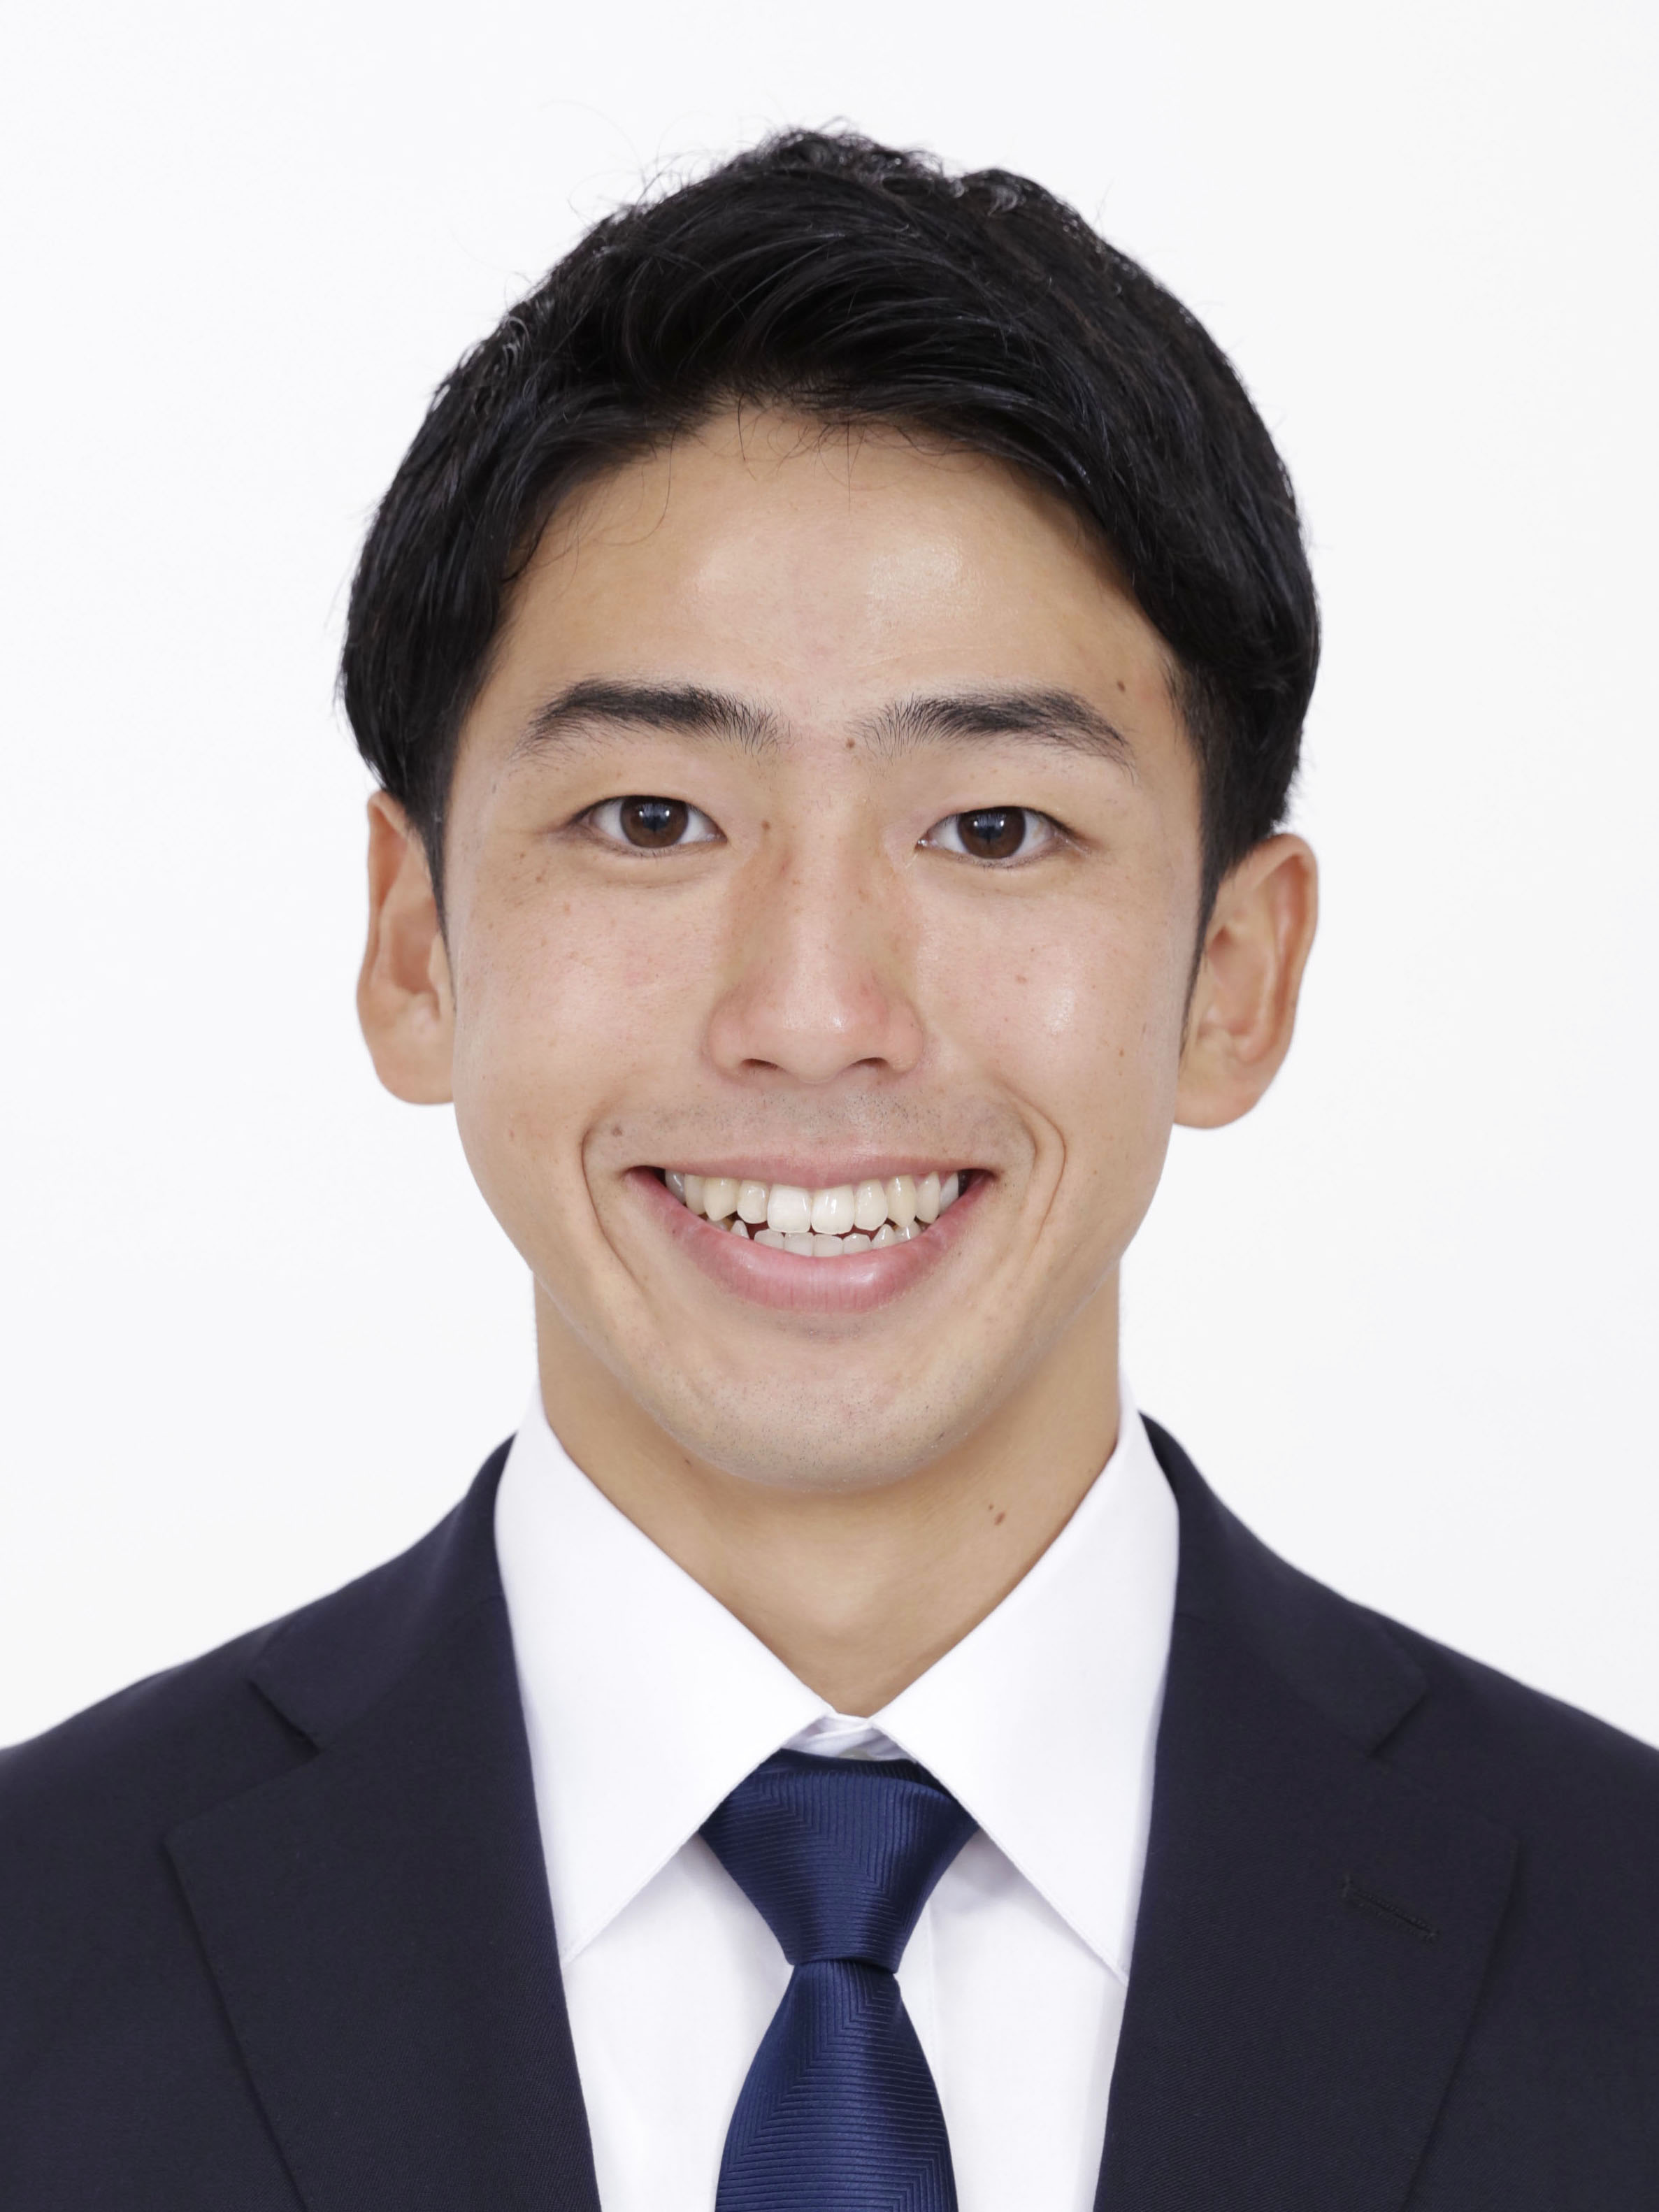 tokyo-photo-studio-graduate